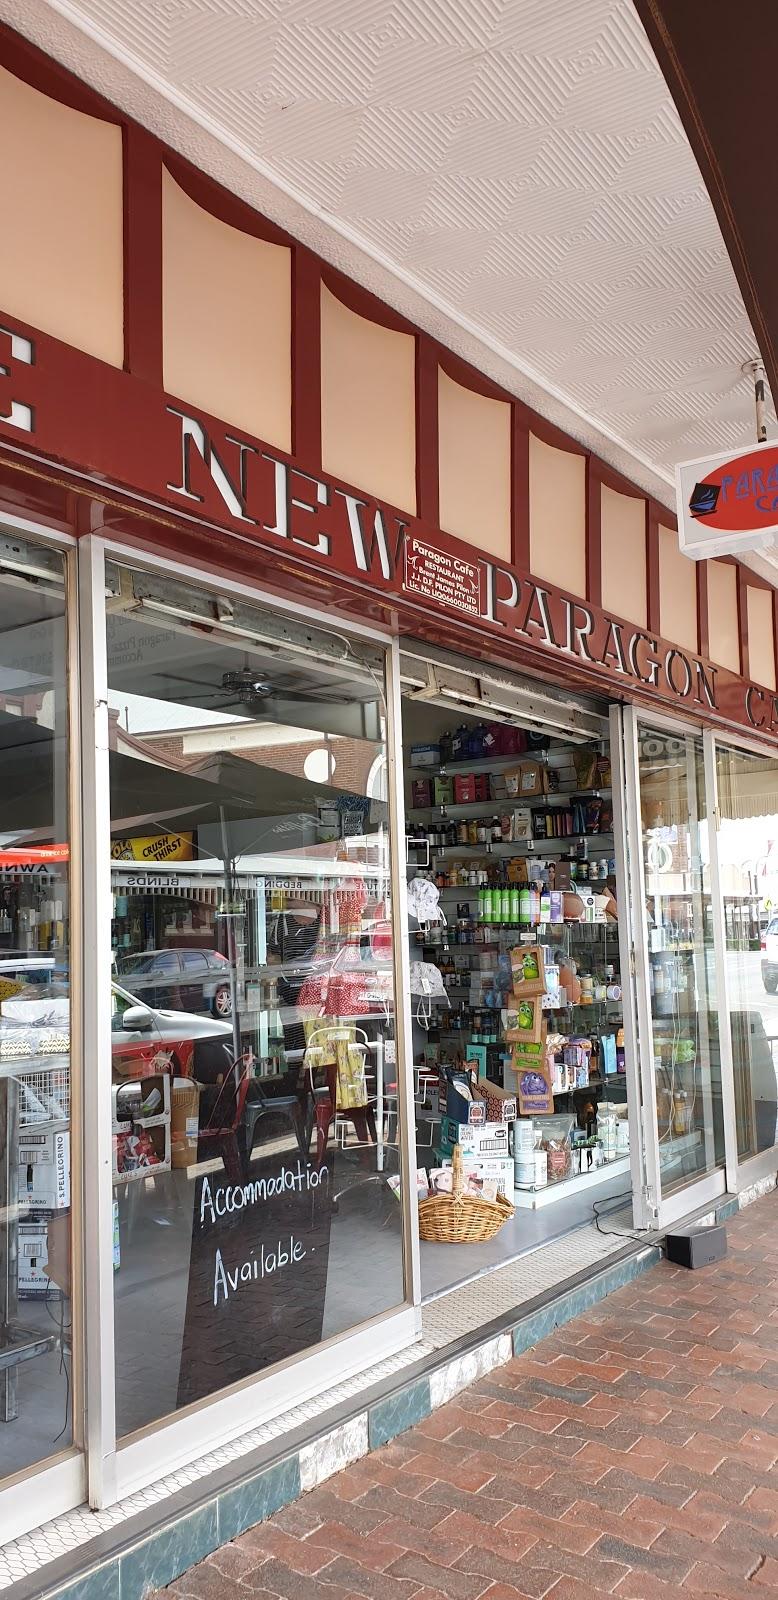 Paragon Cafe | cafe | 132 Main St, West Wyalong NSW 2671, Australia | 0269722187 OR +61 2 6972 2187